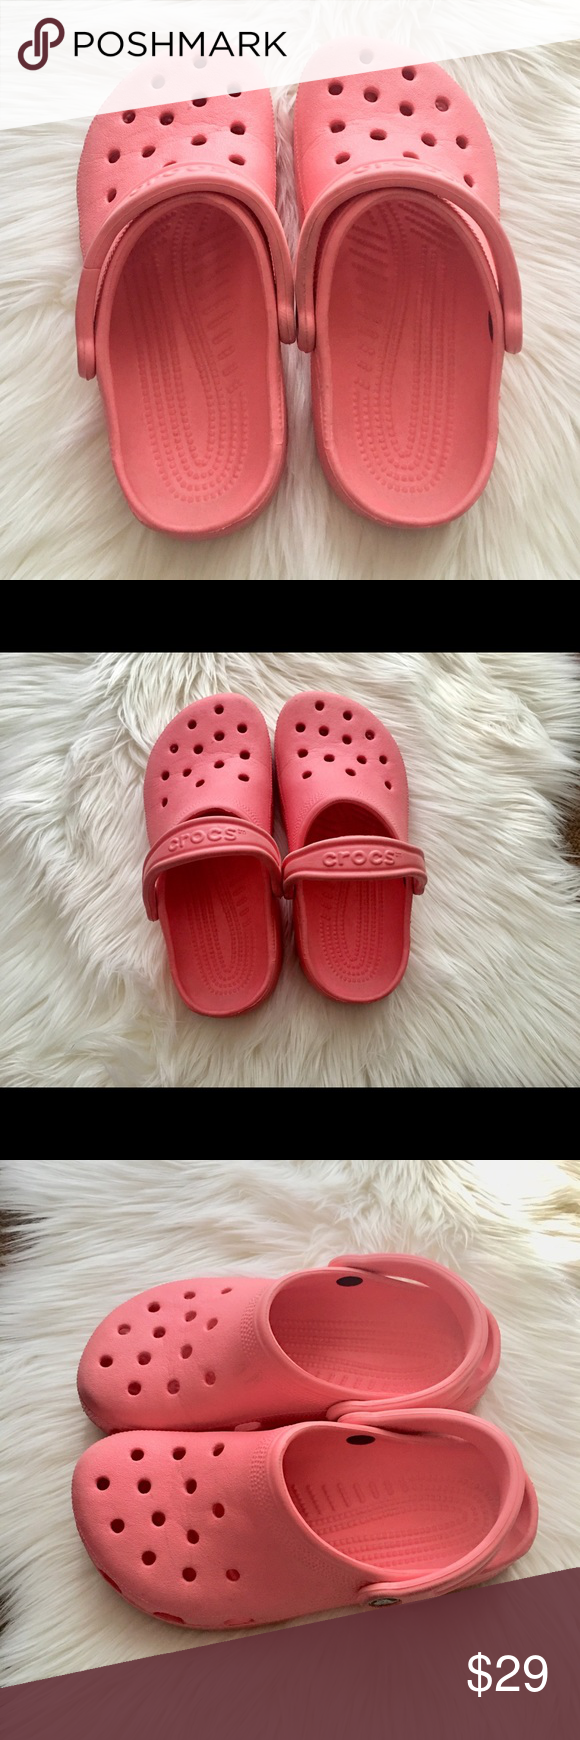 cba82c765 Women Crocs color- Pink peach salmon Women s Crocs Classic Water Friendly  Clogs.